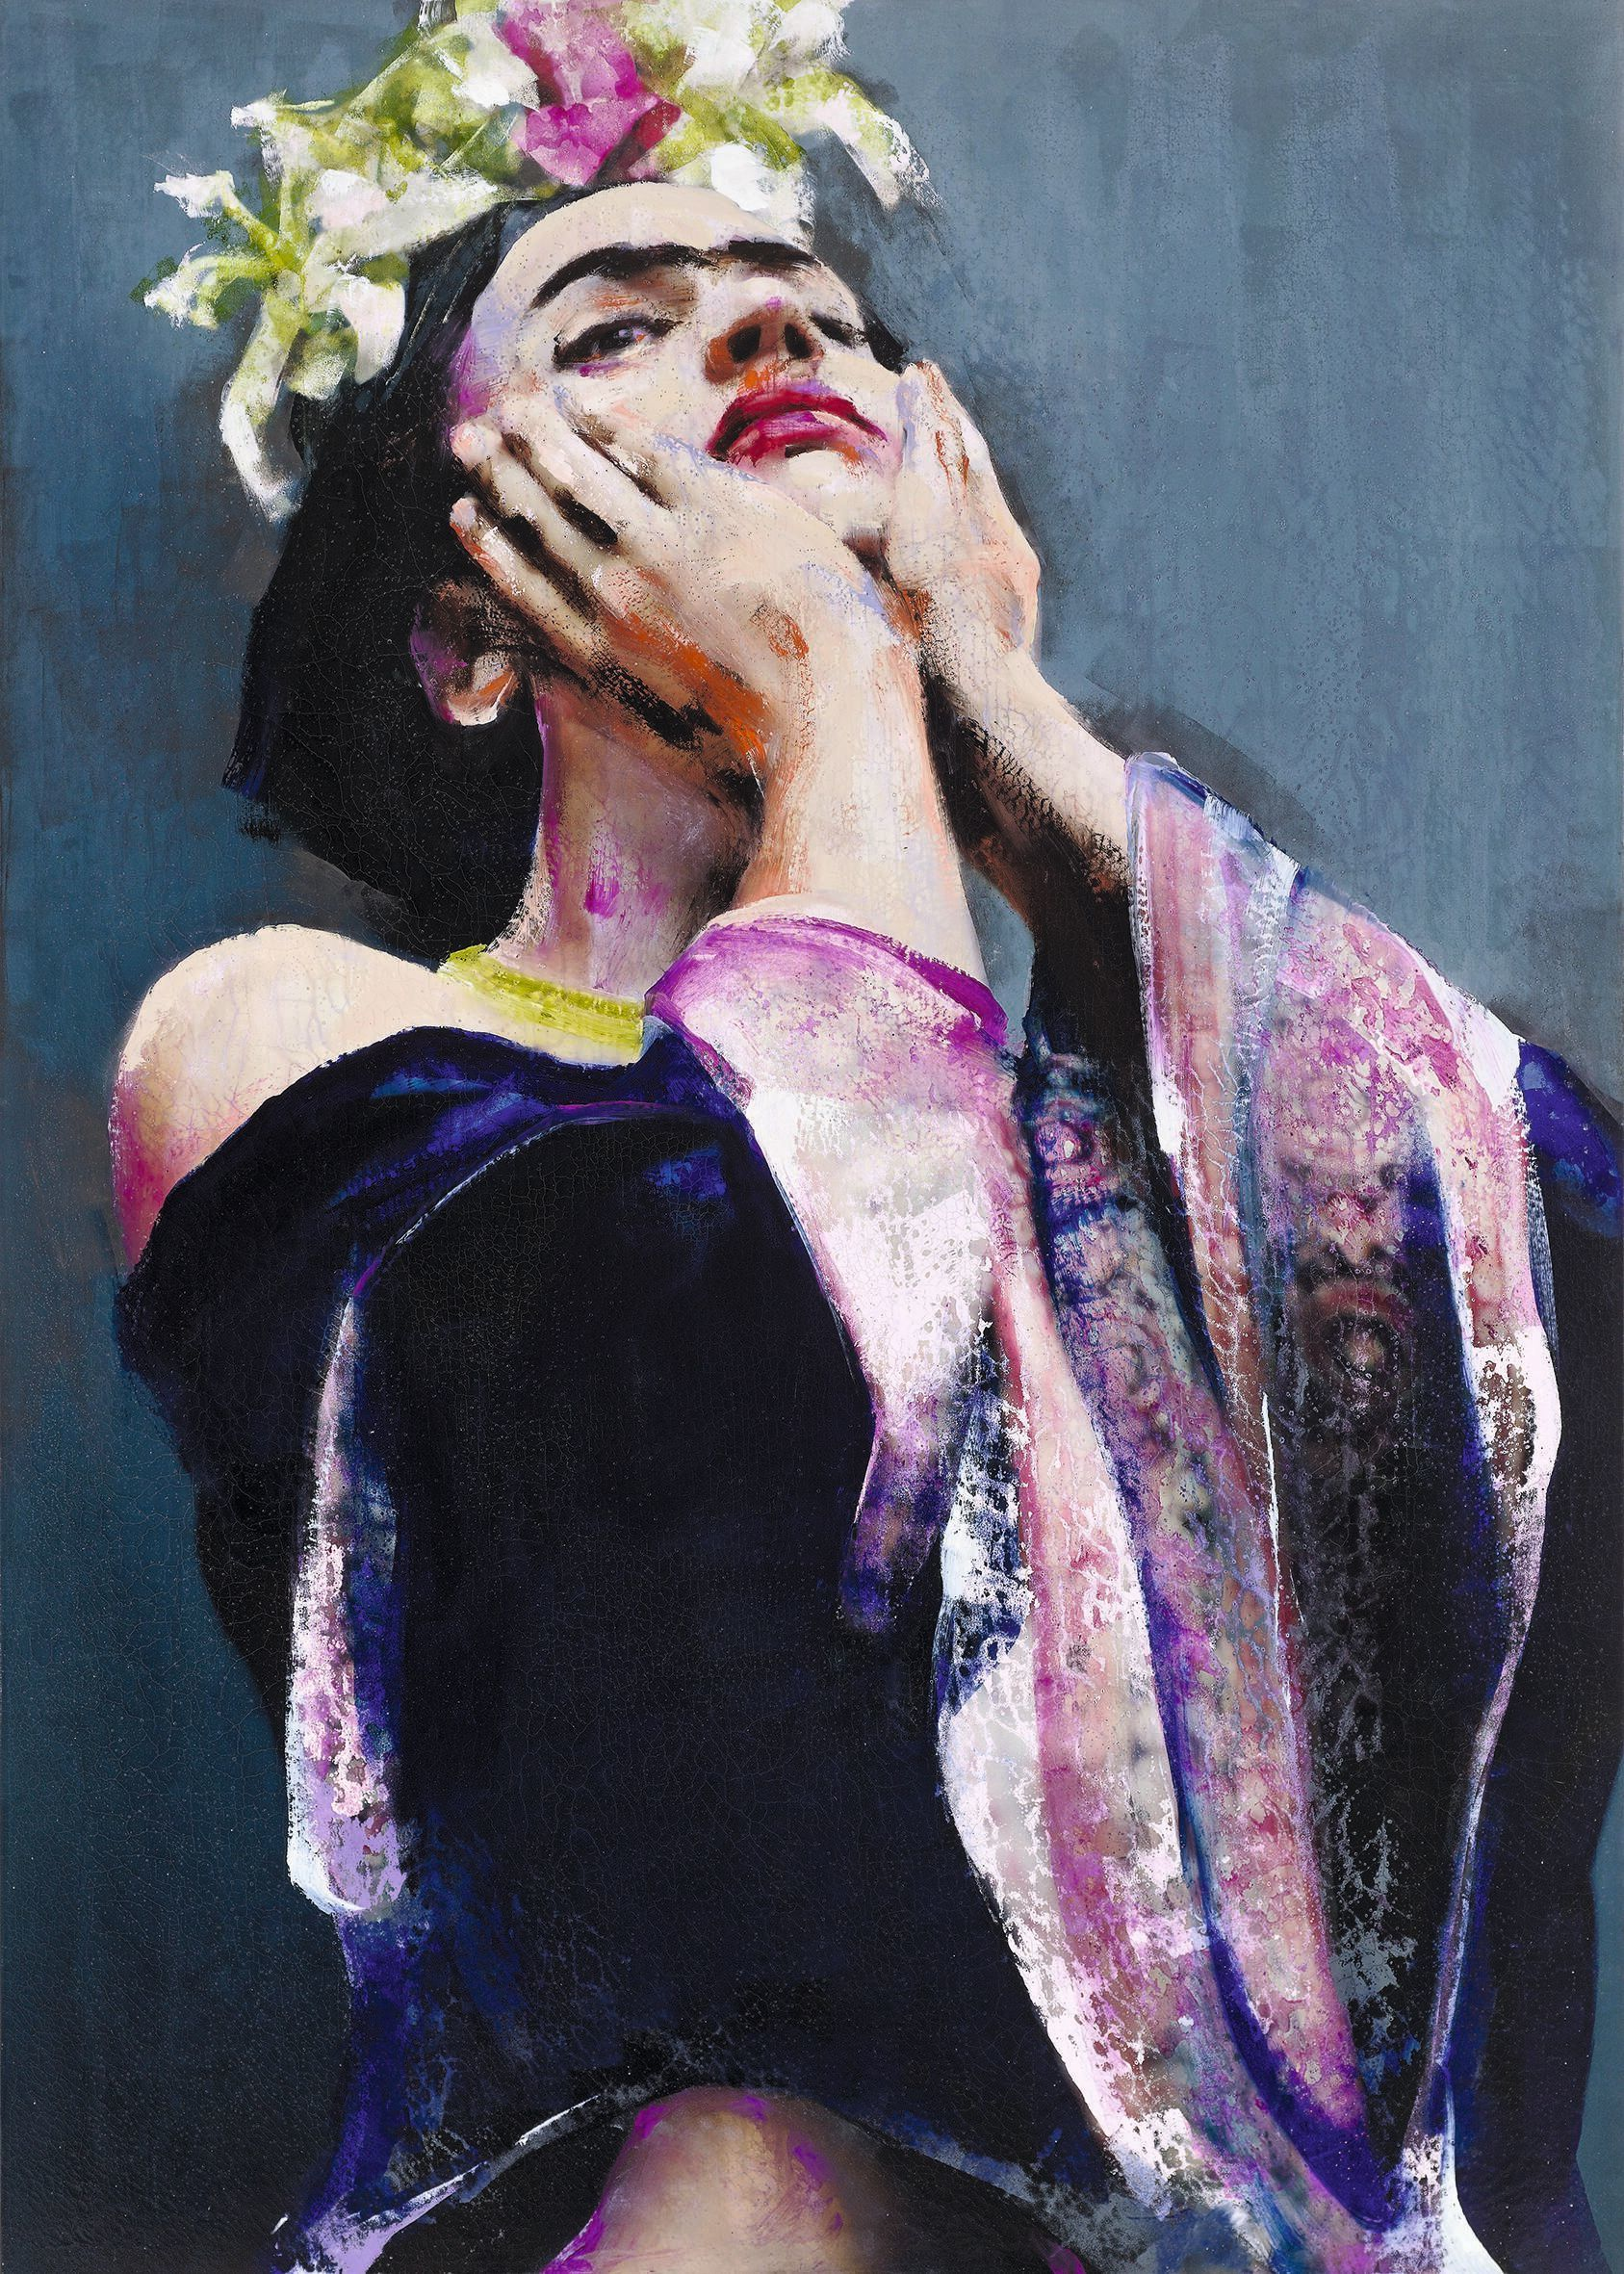 Lita Cabellut, serie Frida, La perla negra, 2011.